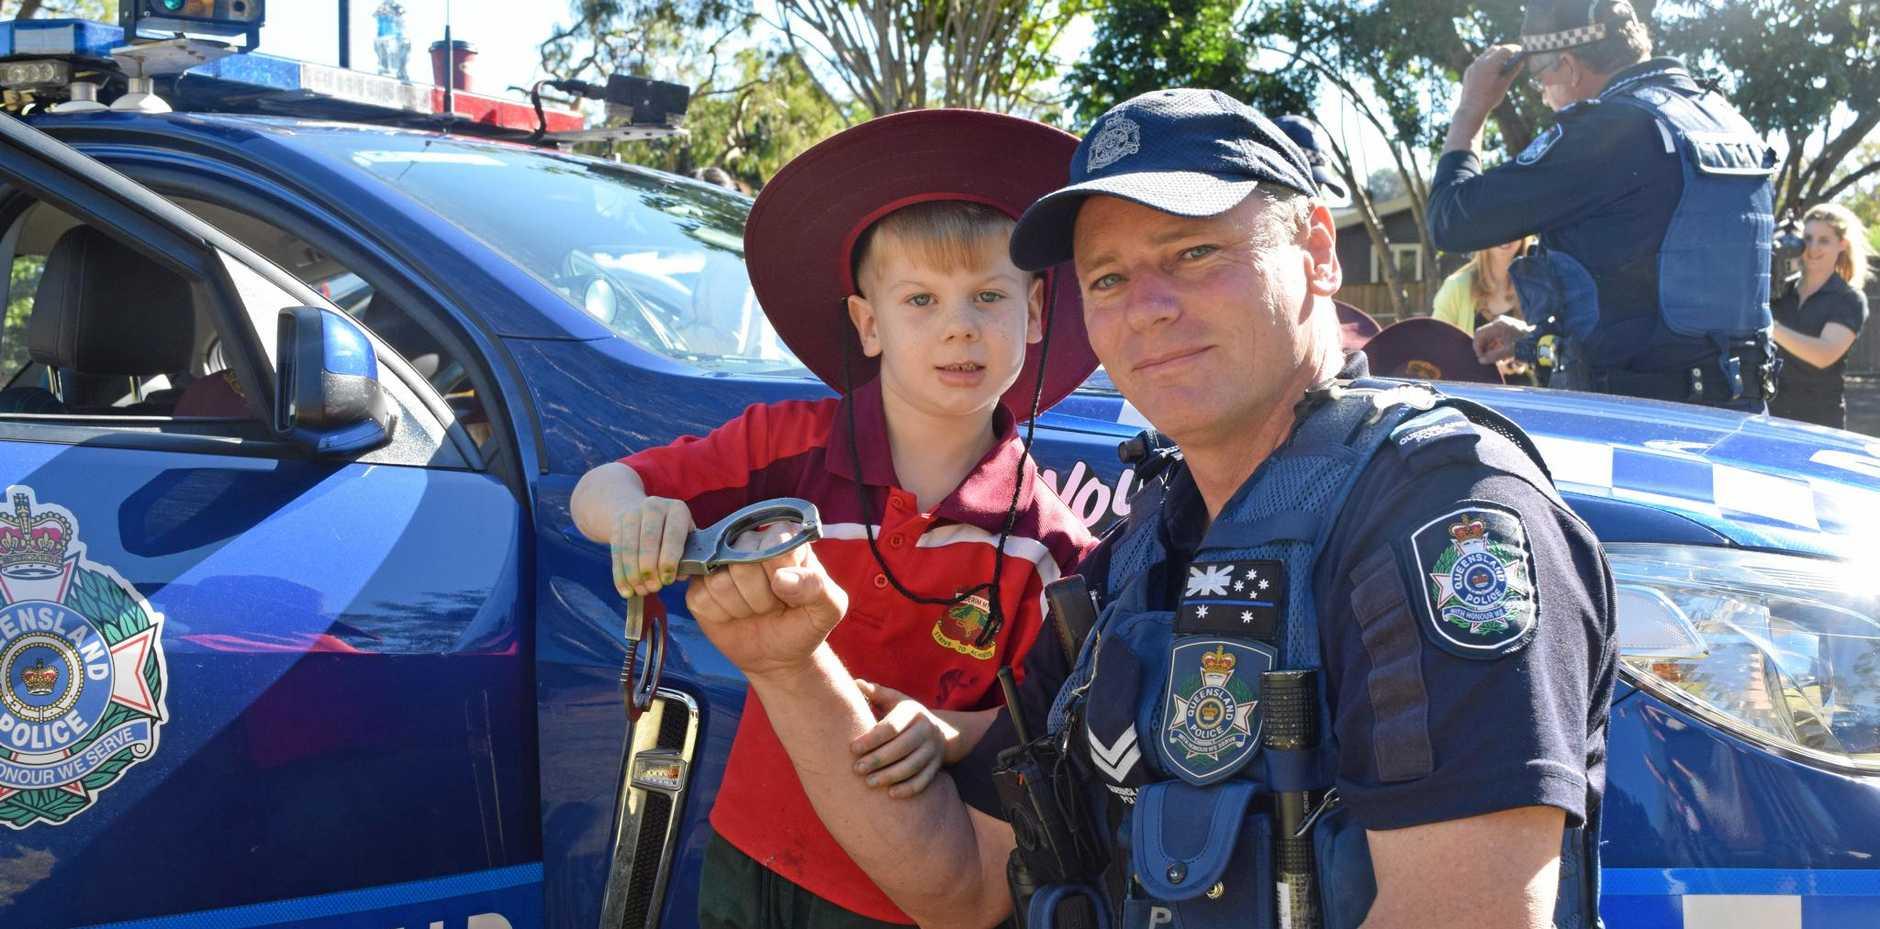 SAFETY FIRST: Senior Constable Darryl